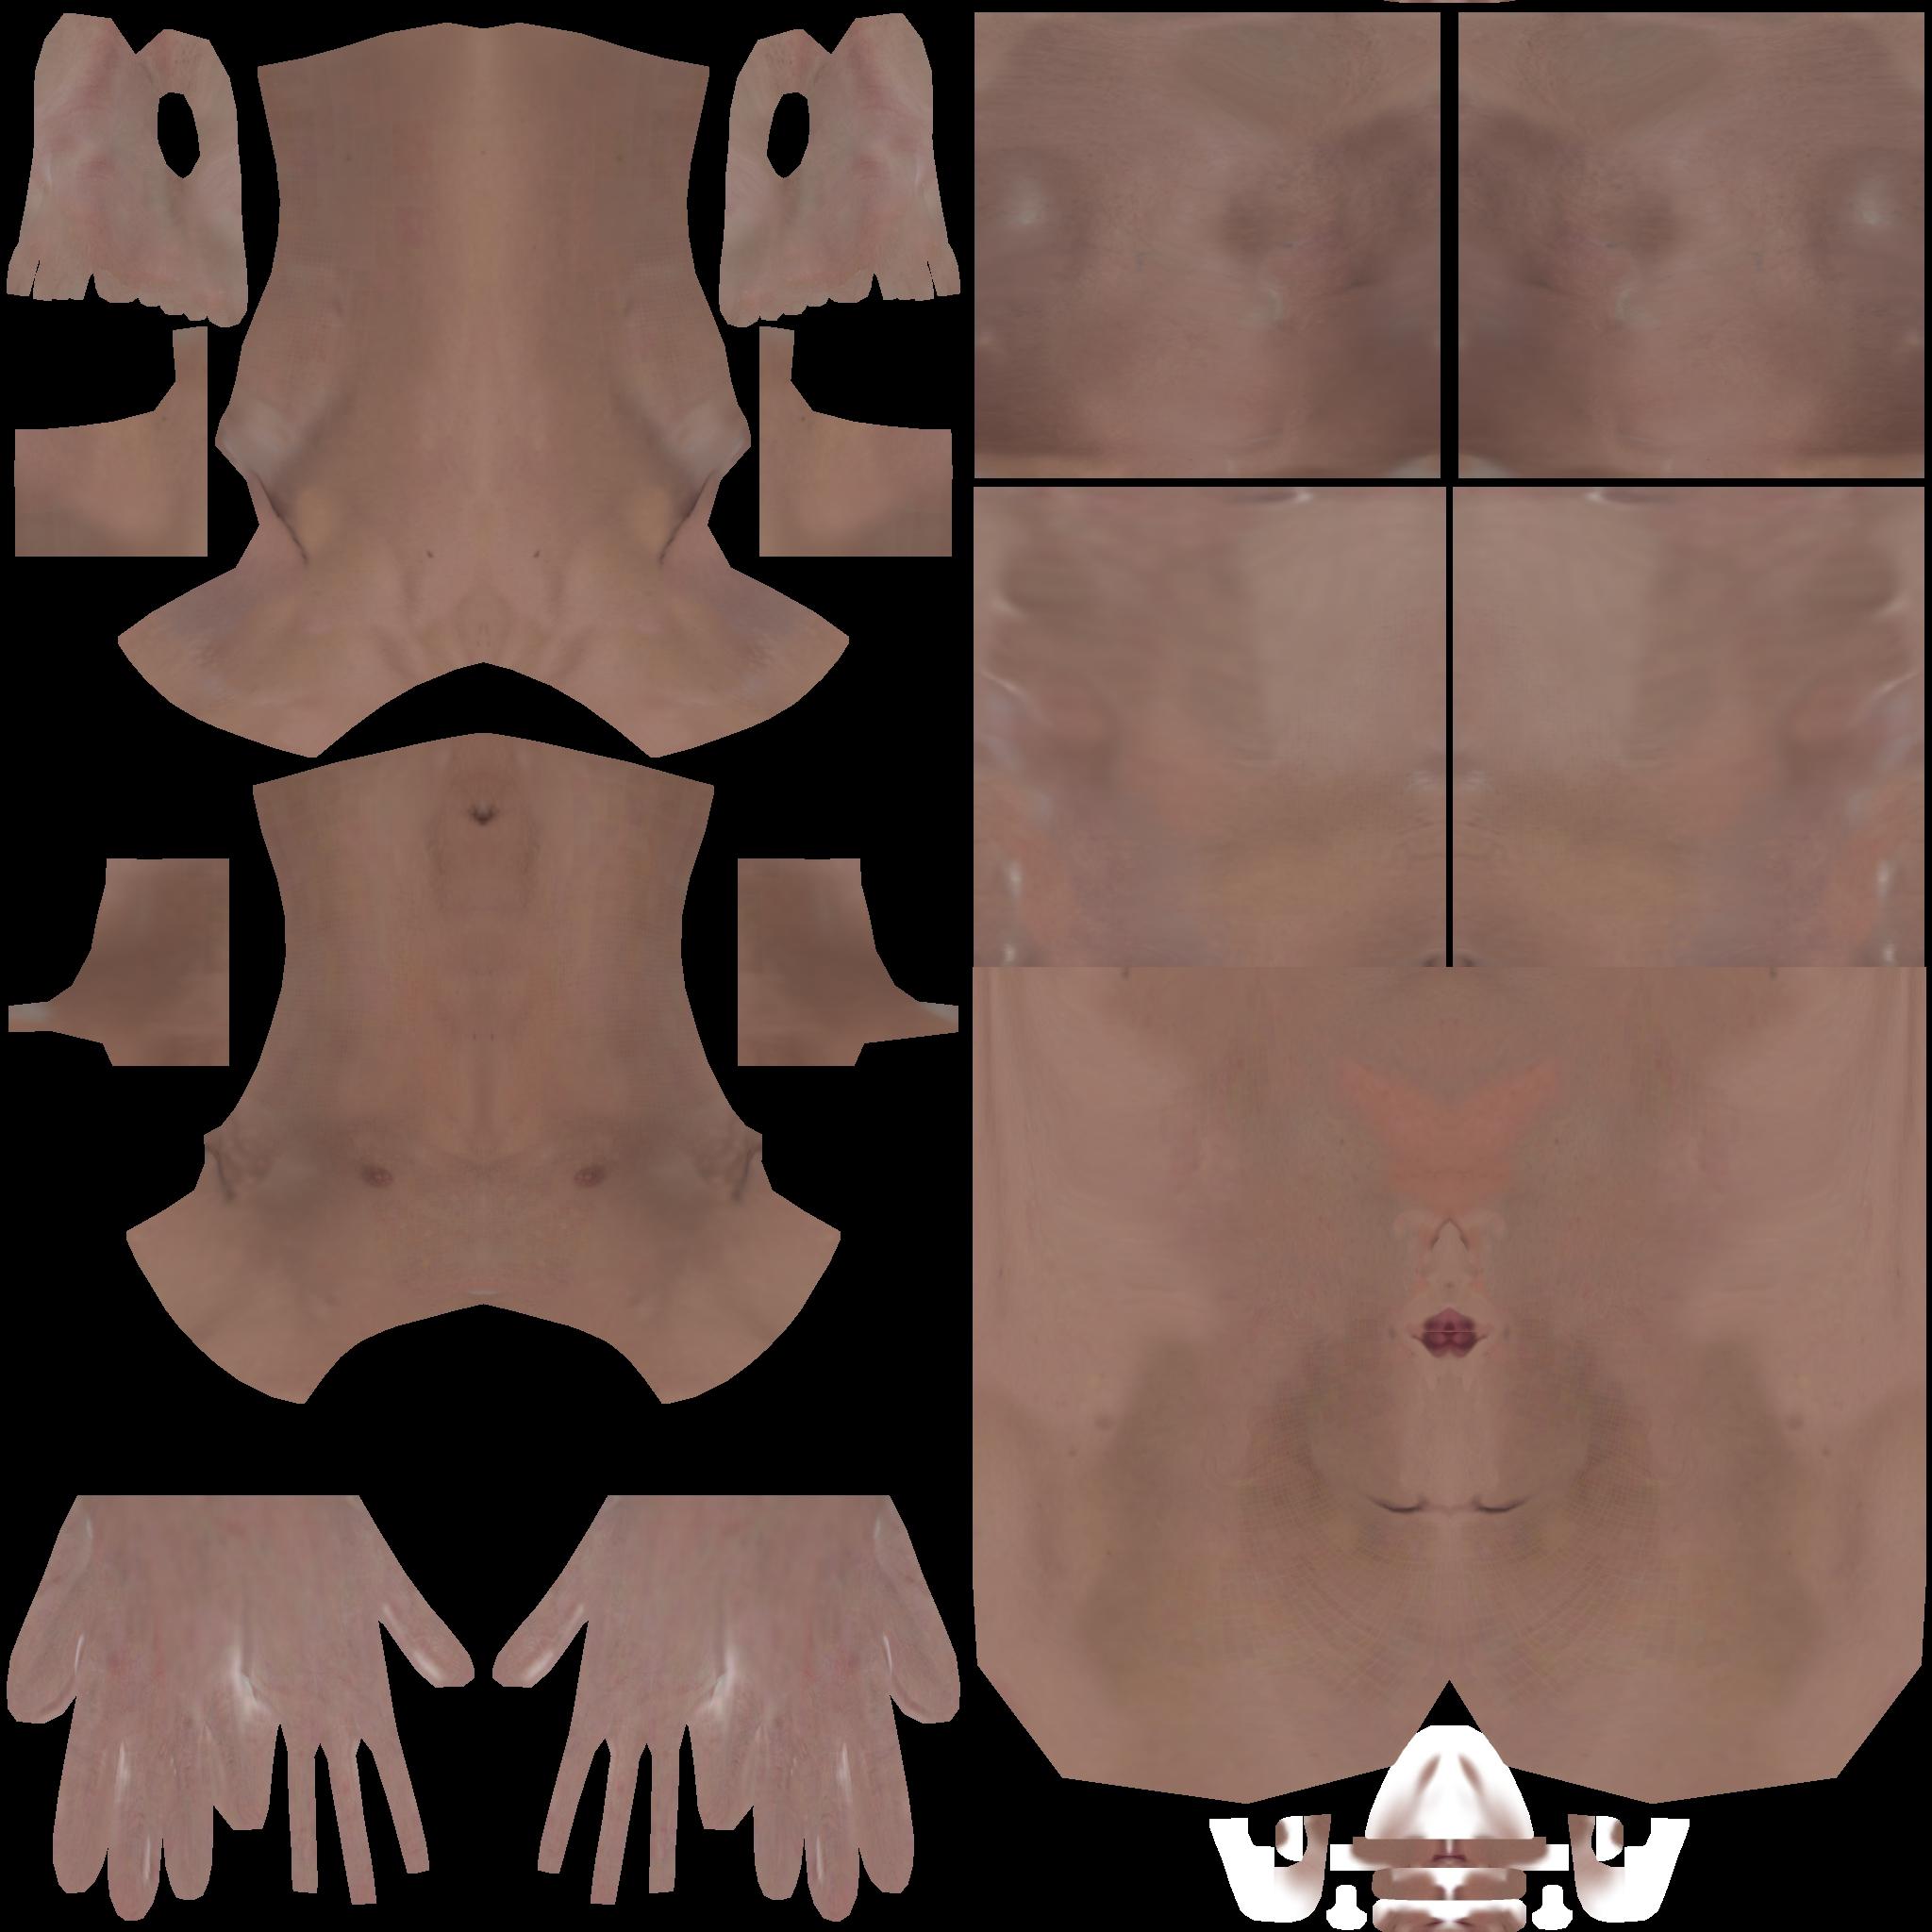 detaljan muški akt 3d model teksture obj ztl 141096